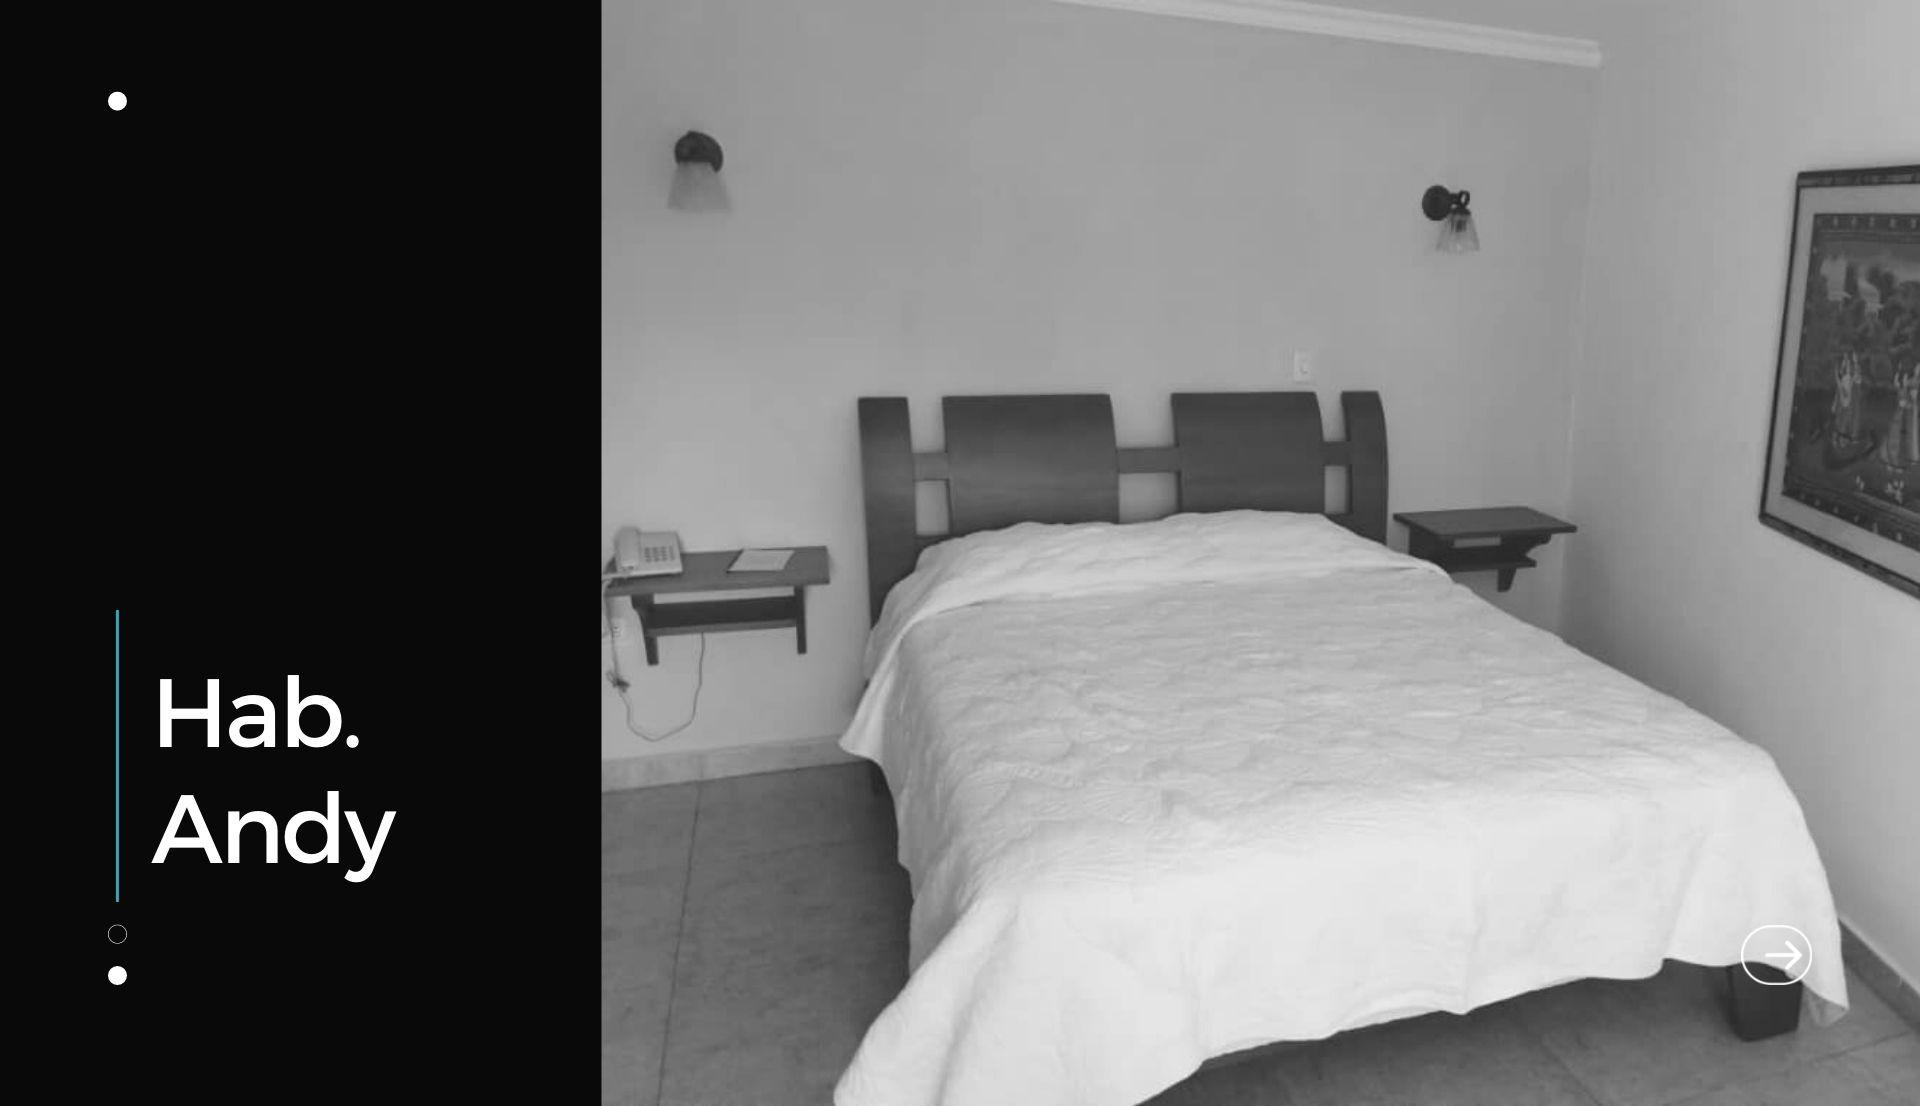 habitación con cama adicional en san cristobal